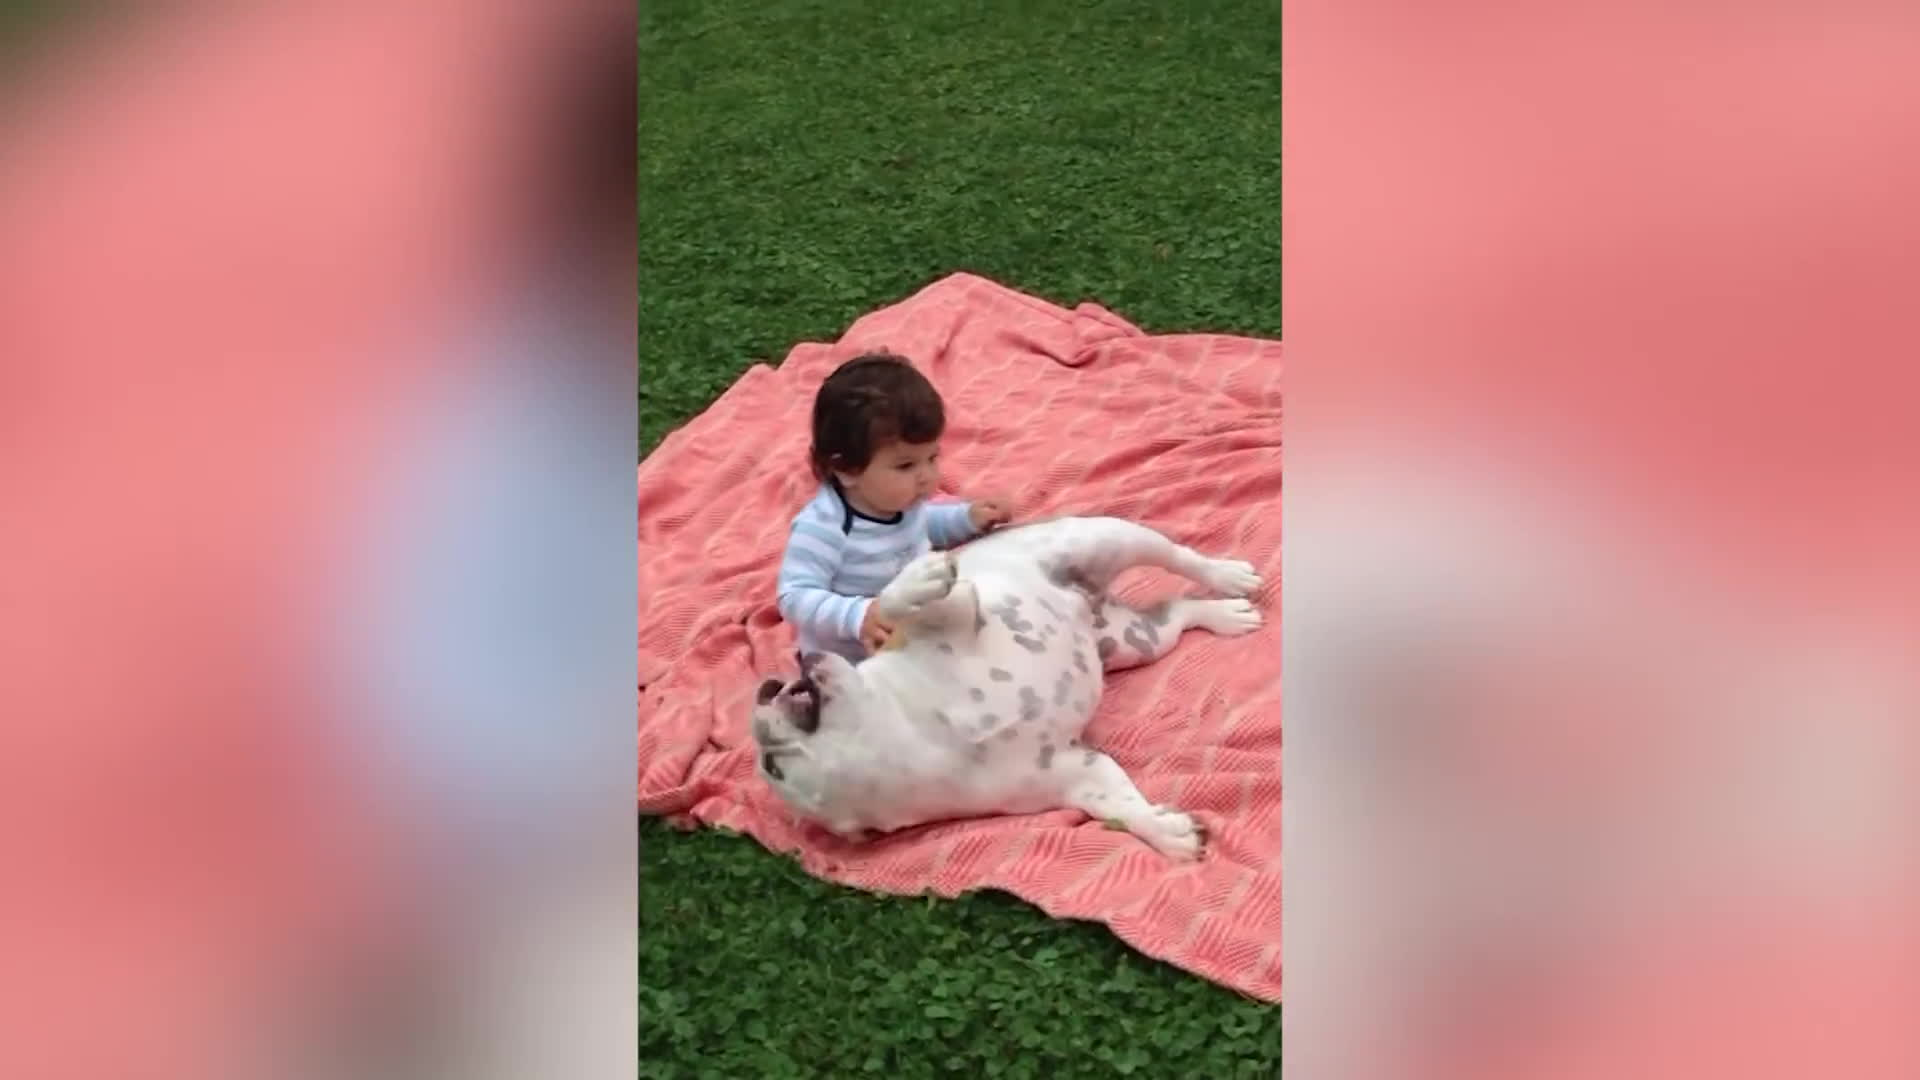 ChildrenFallingOver, funny videos, holdmyjuicebox, Funniest Animal Fails October 2016 Compilation   Funny Pet Videos GIFs